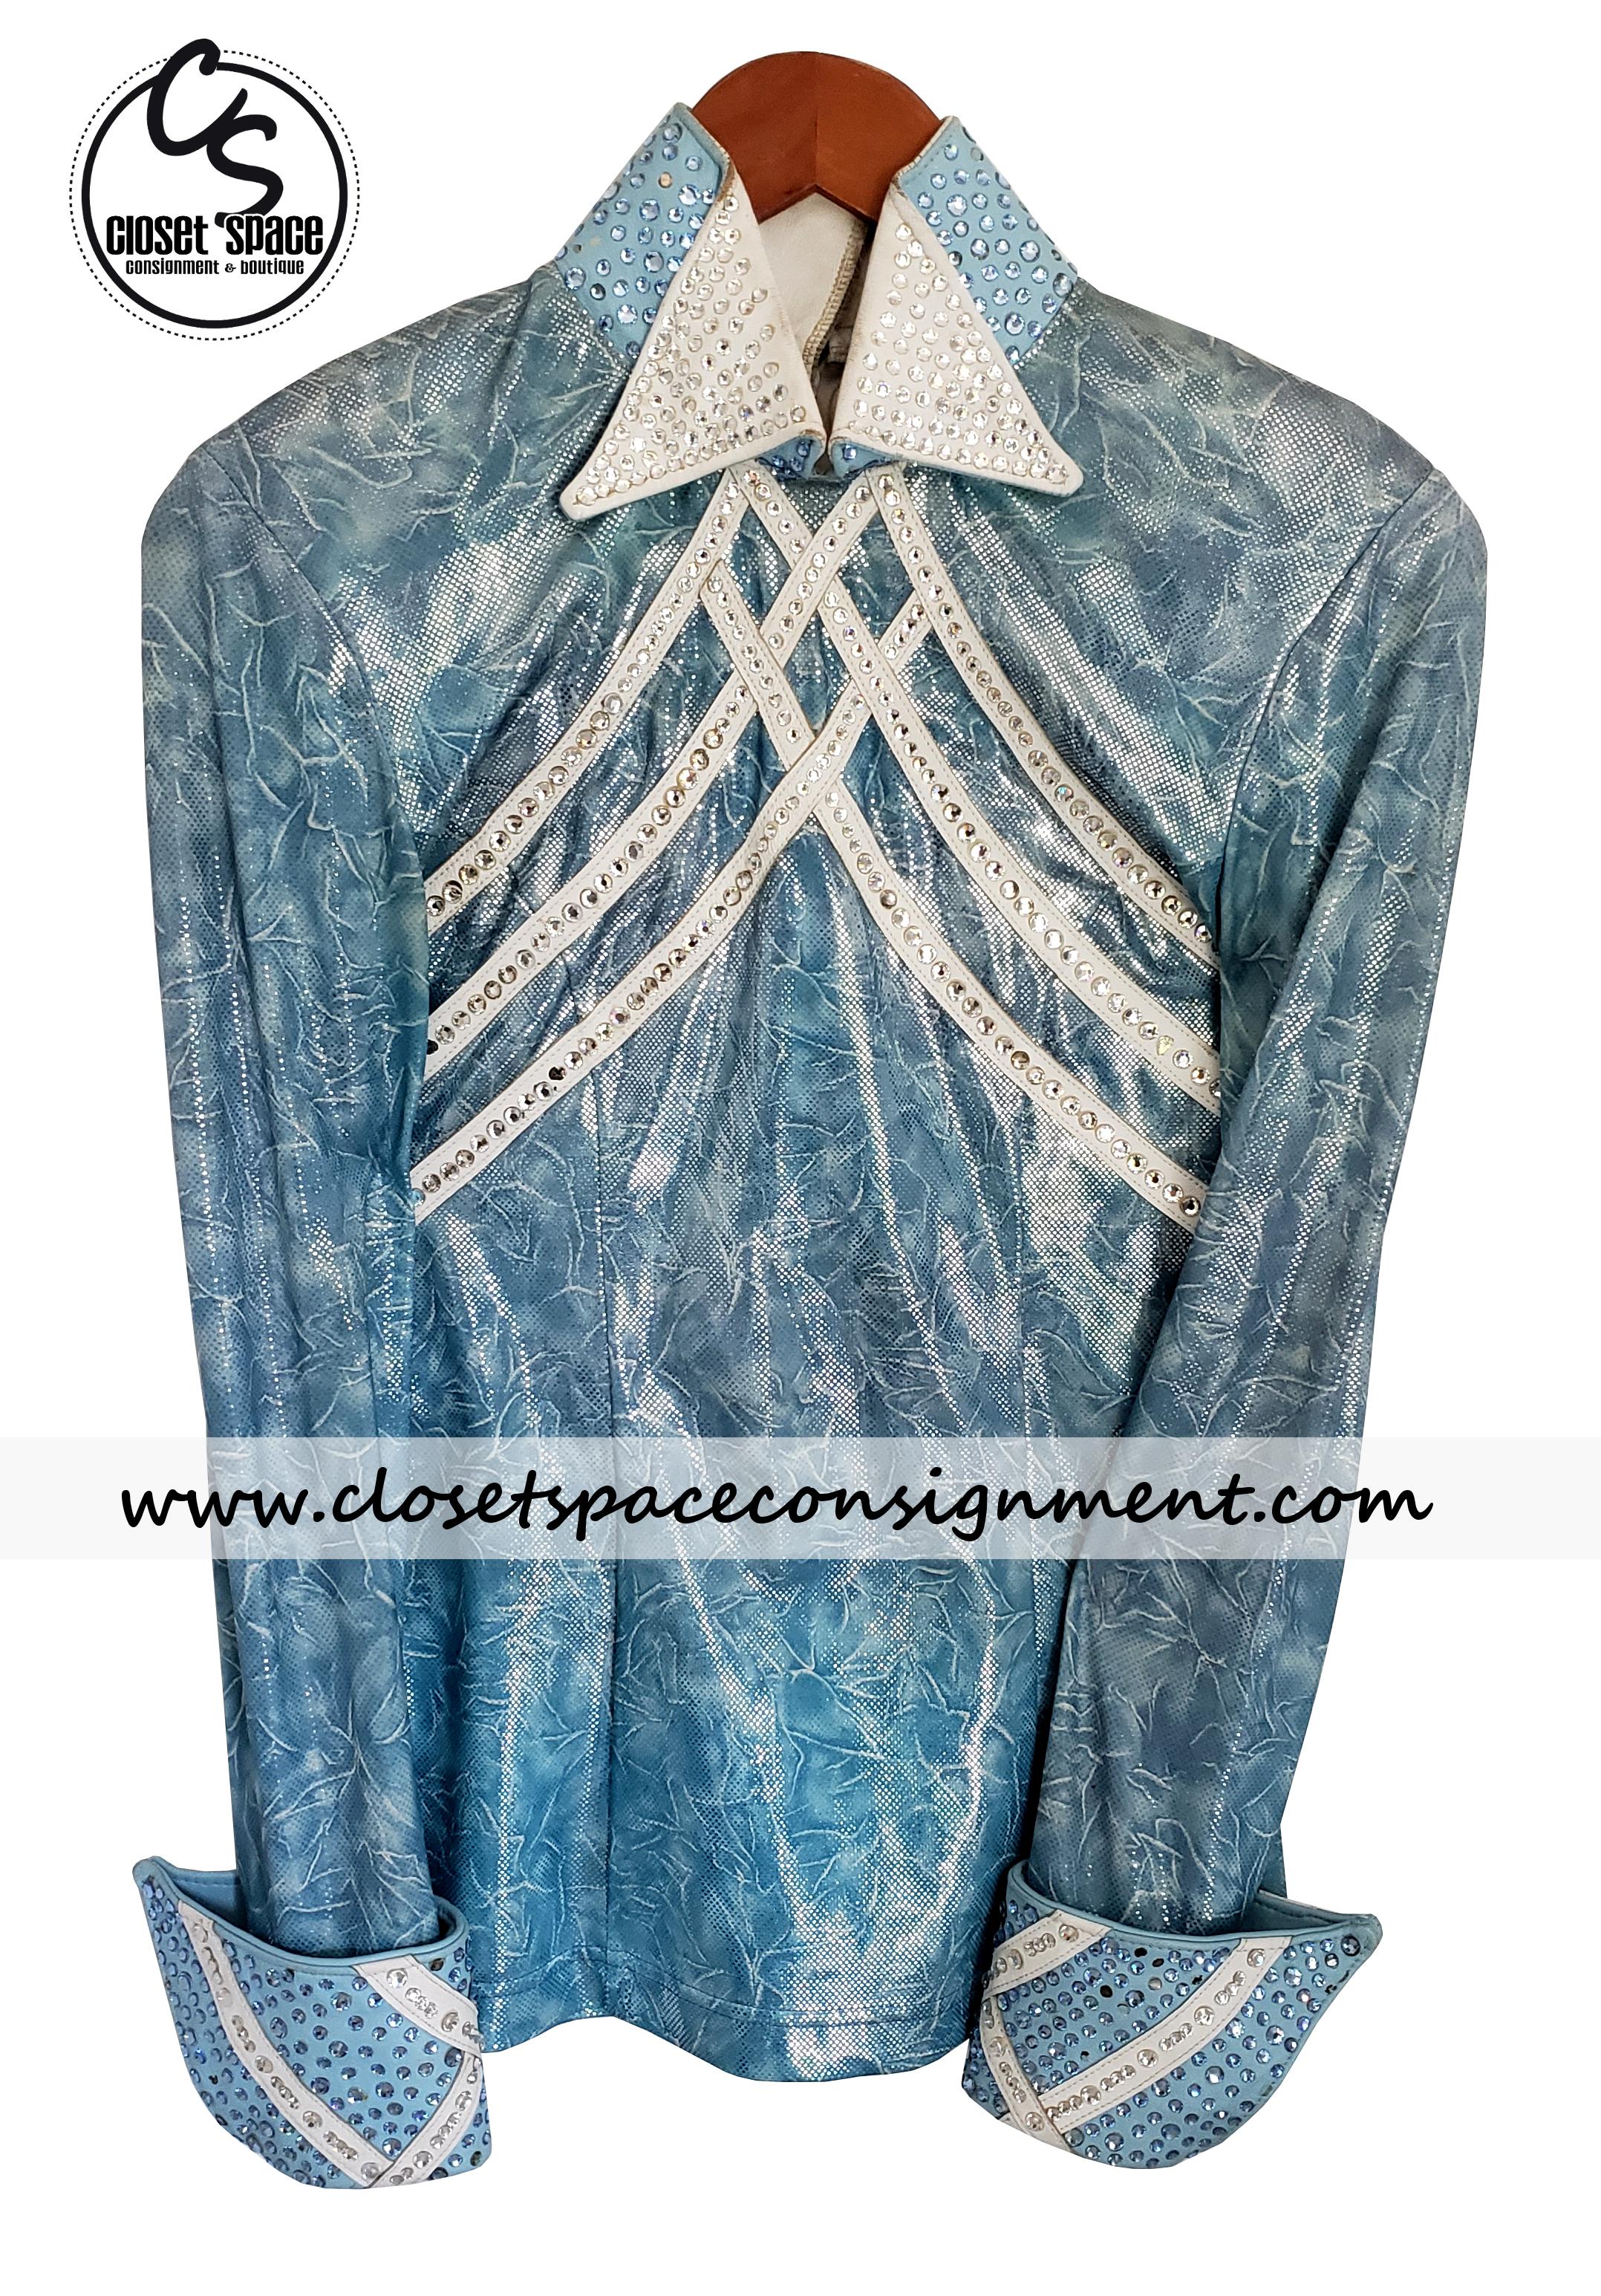 'Cassidy's Casuals' Light Blue & White Shirt LH2